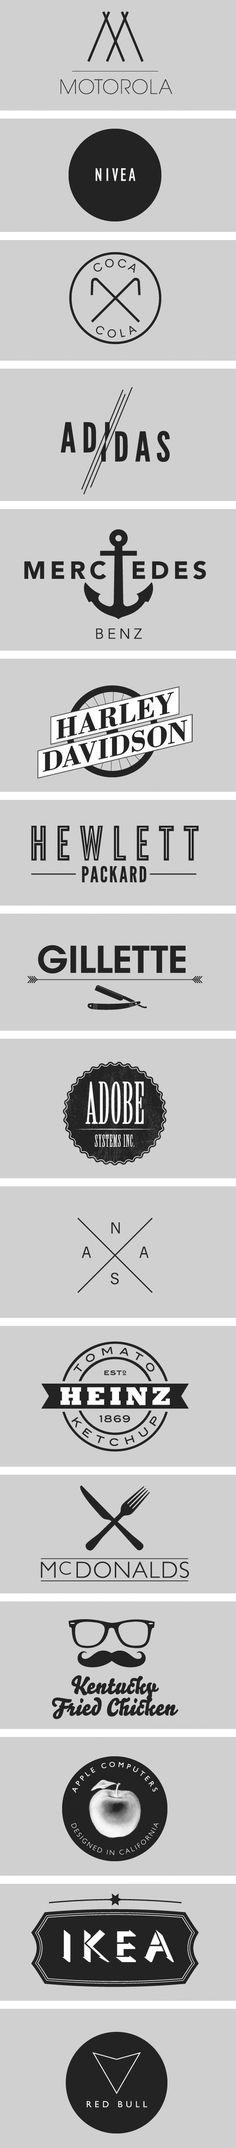 ha hipster logos